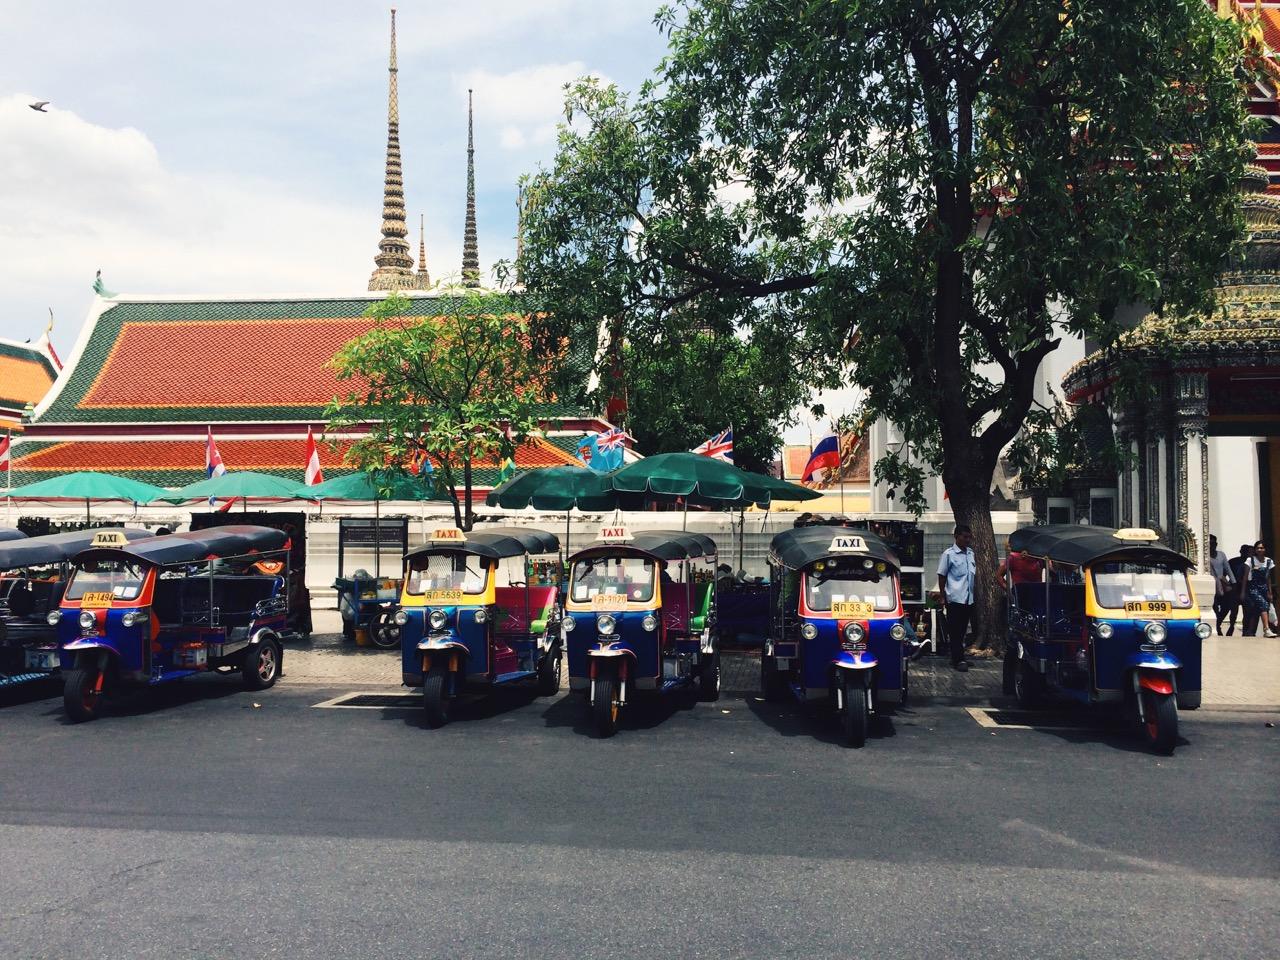 Путешествие по Таиланду, Бангкок: Тук-туки